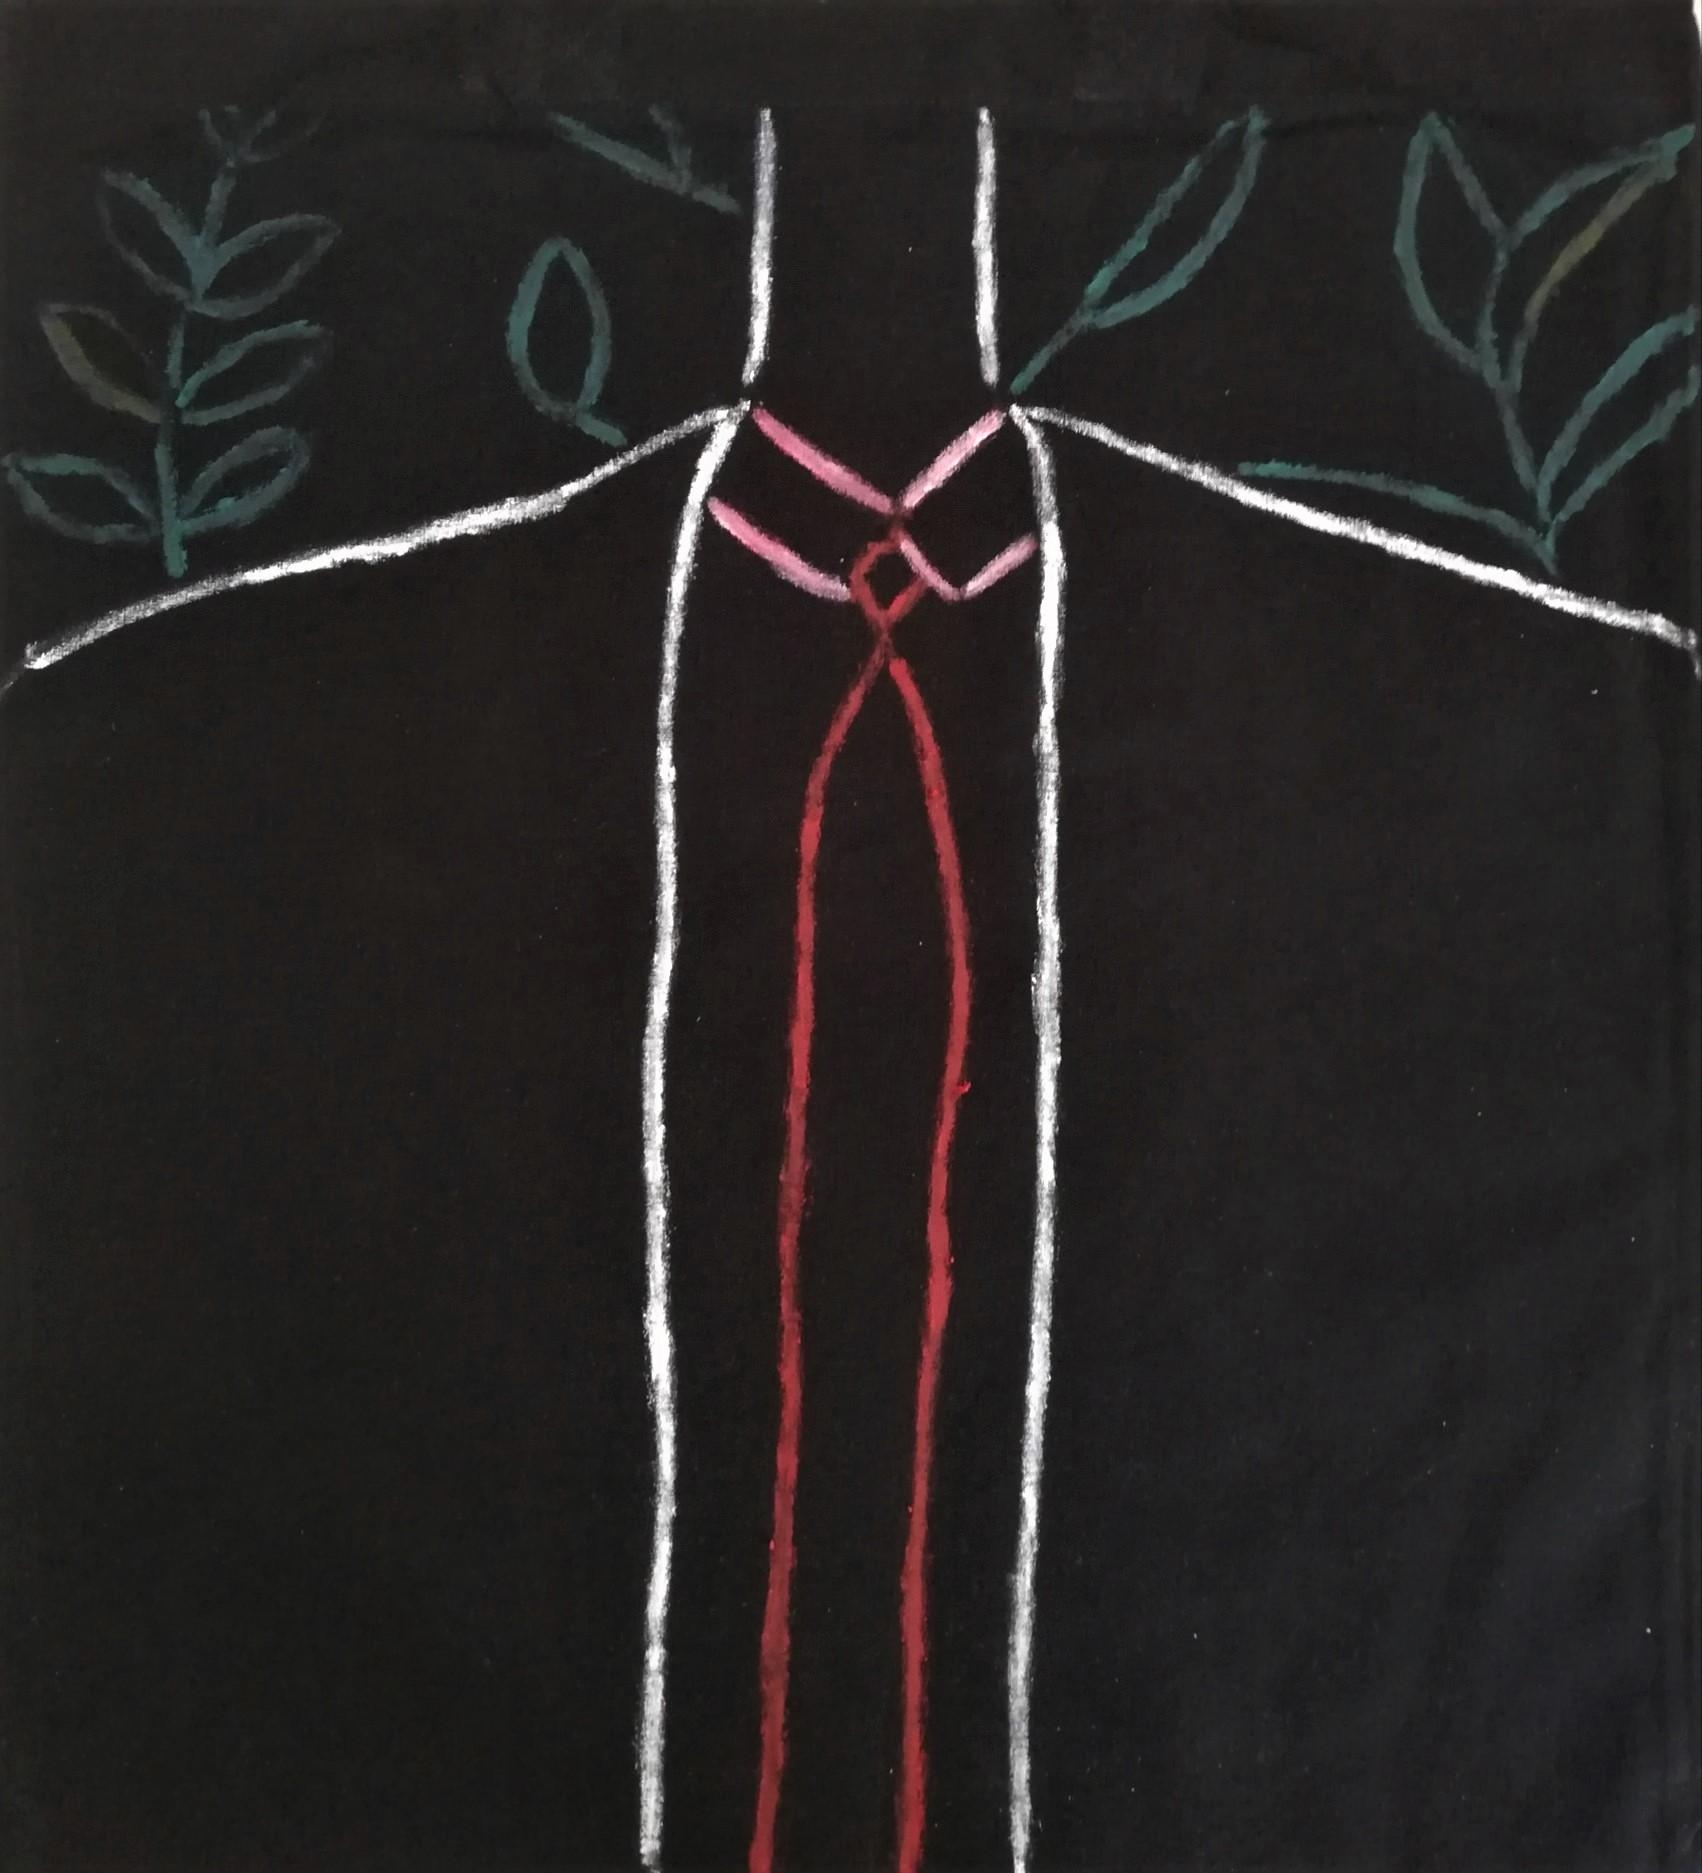 Emanuela Di Filippo  Handpainted Fabric Man Spring/Summer 2019 Hanpainted Tote bag Cotton 38cm X 42 cm X 70cm 2019